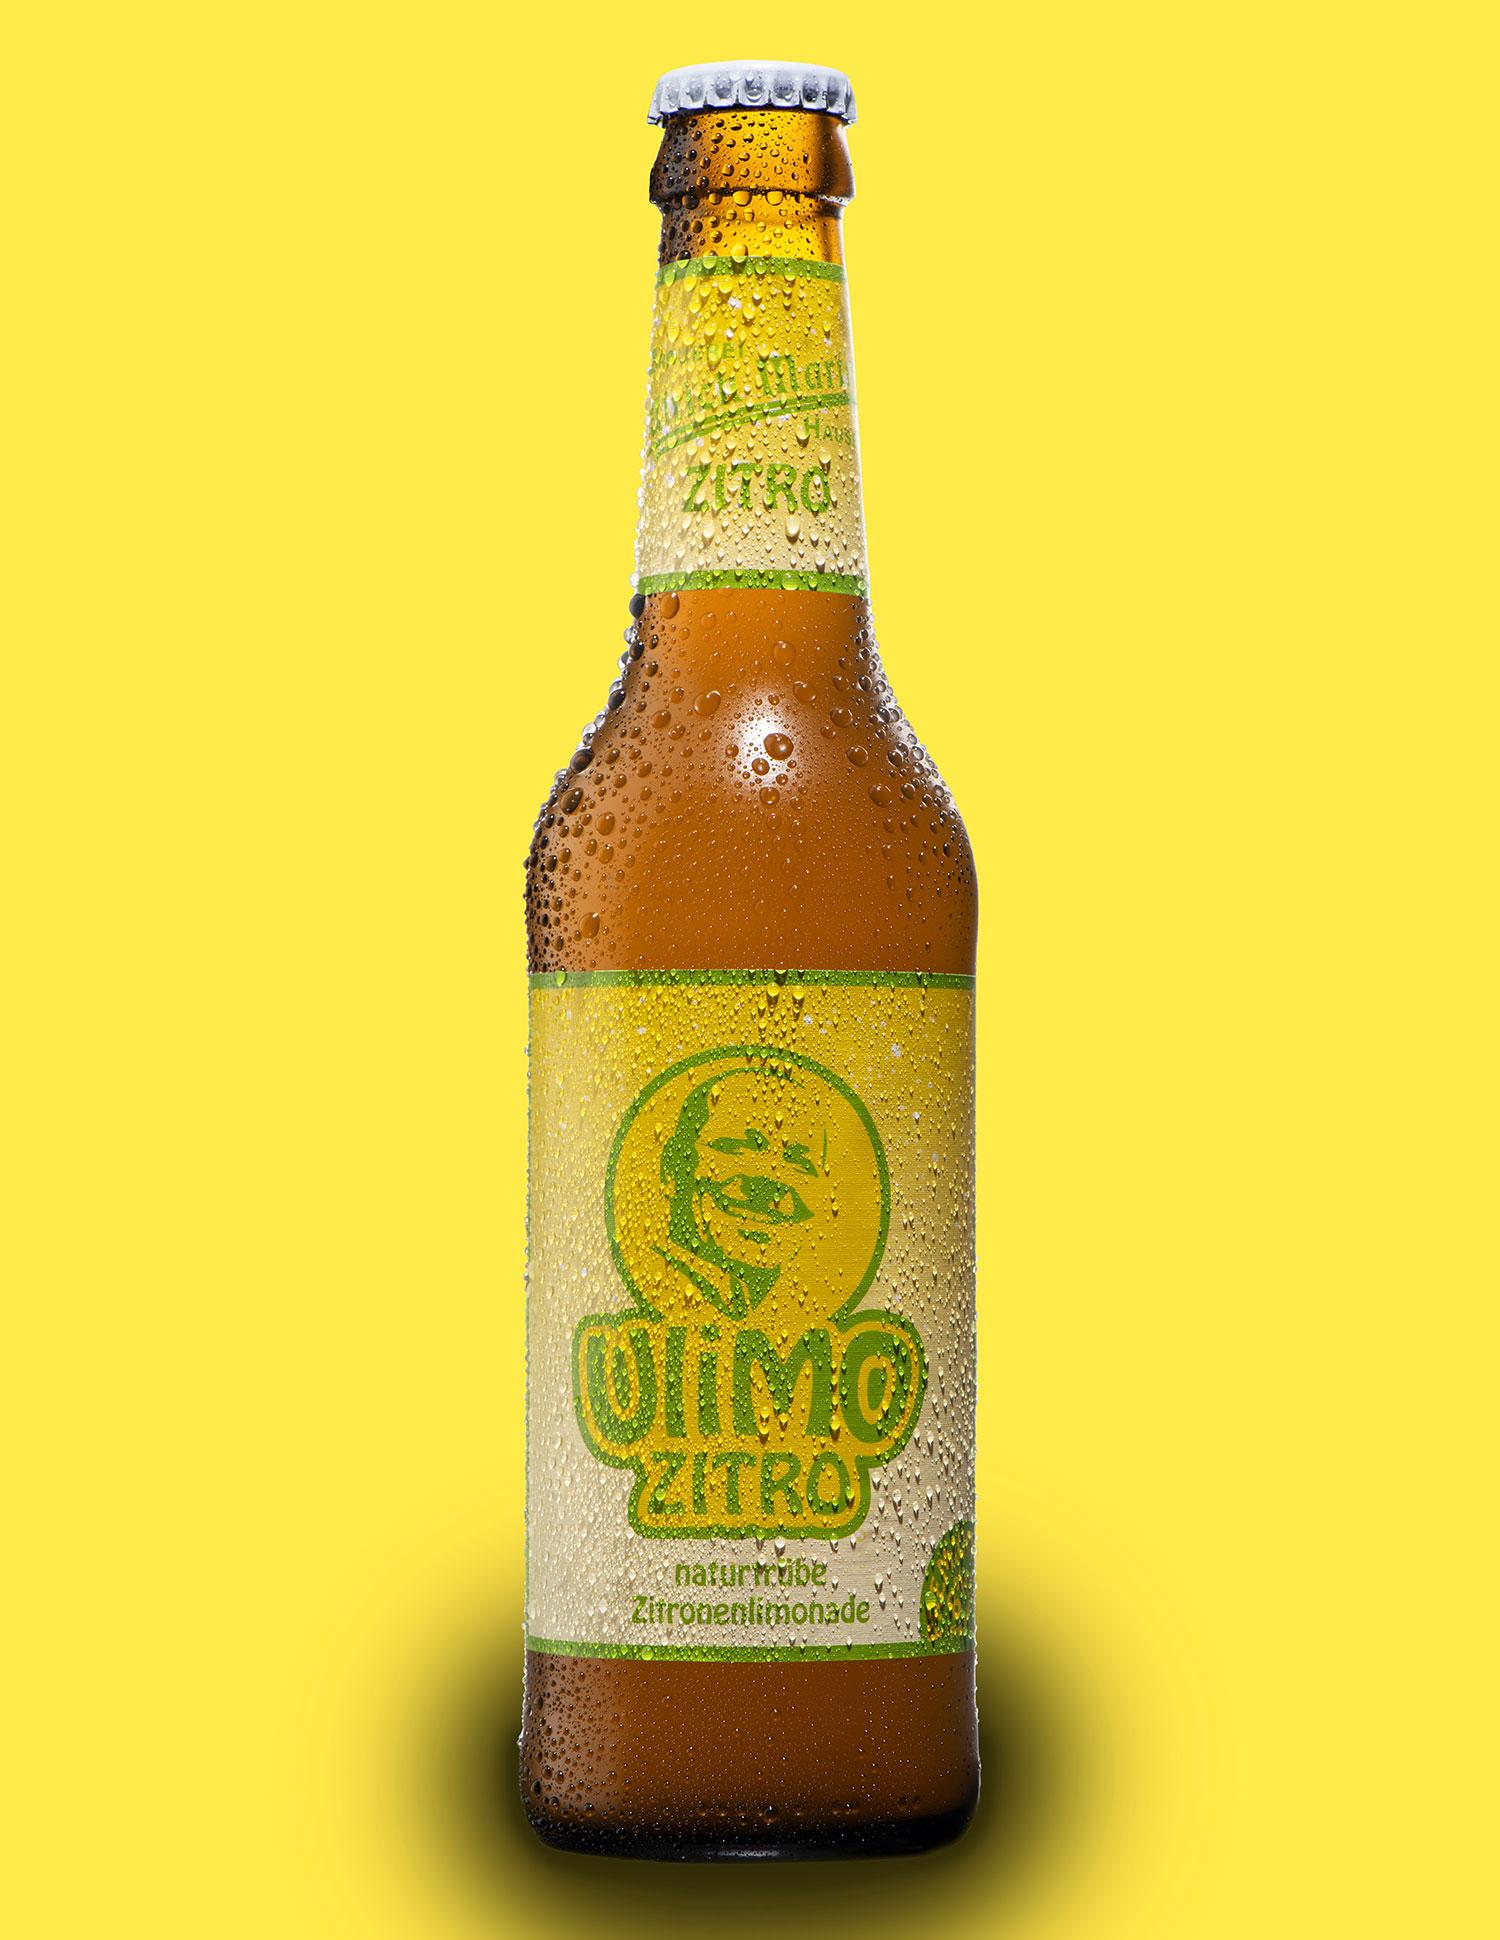 naturtrübe Zitronenlimonade Ulimo Zitro